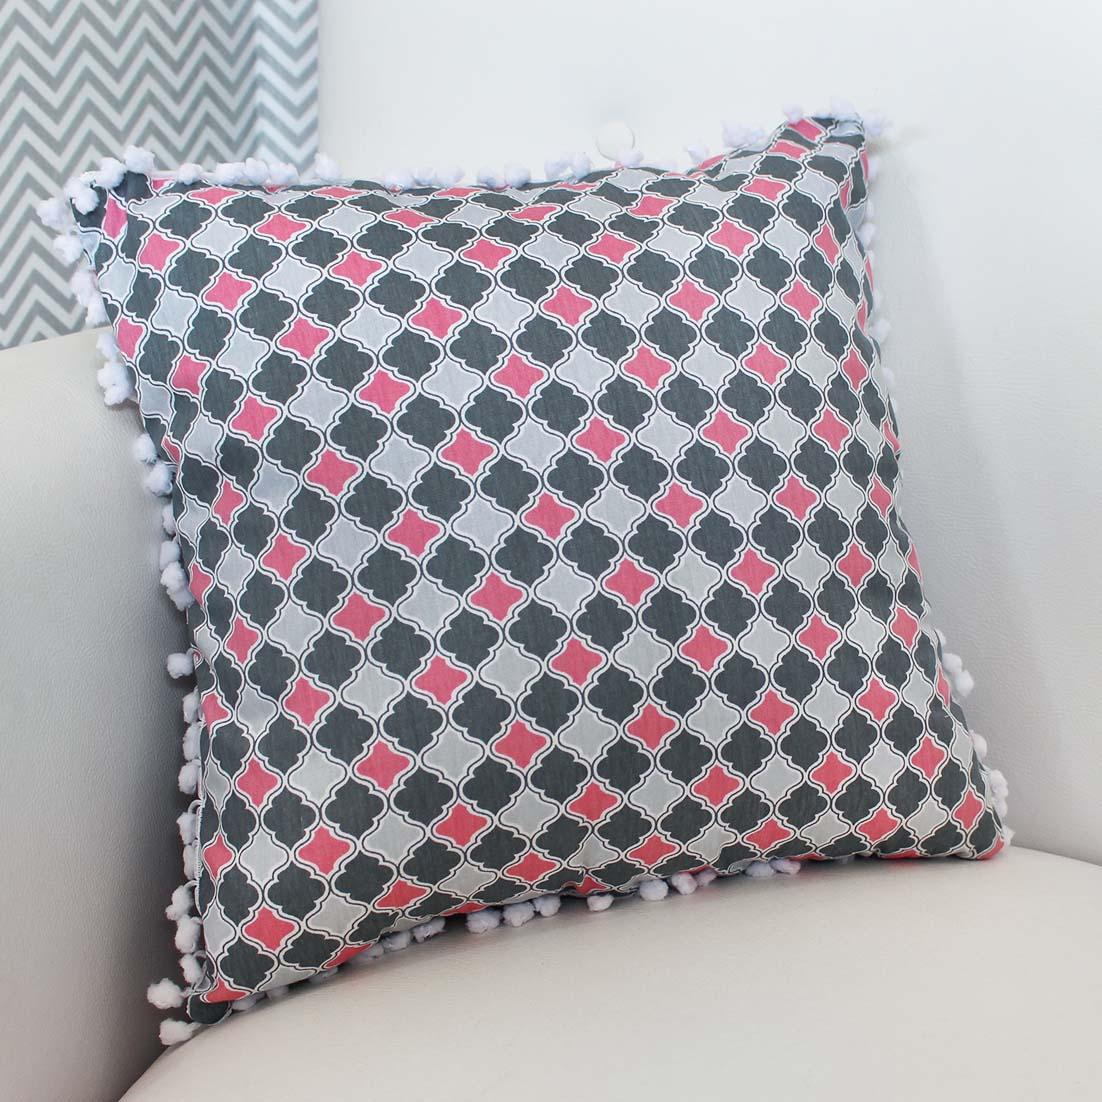 Almofada Decorativa Estampada Geometrico